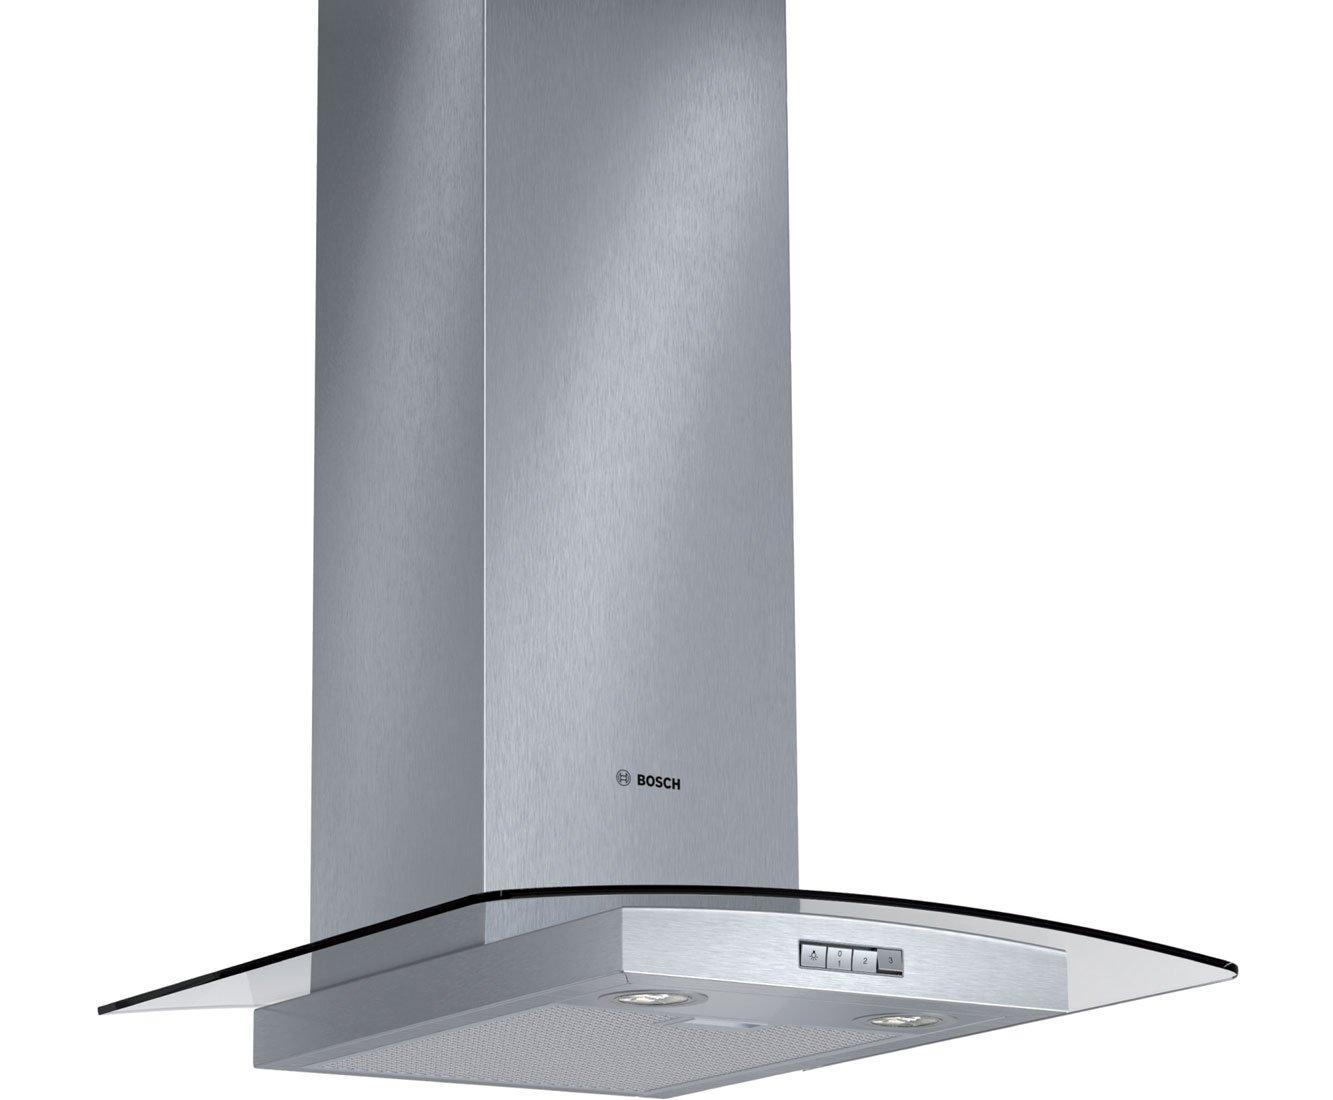 Bosch DWA064W51B - Campana (450 m³/h, Canalizado/Recirculación, D, E, B, 62 dB): Amazon.es: Hogar